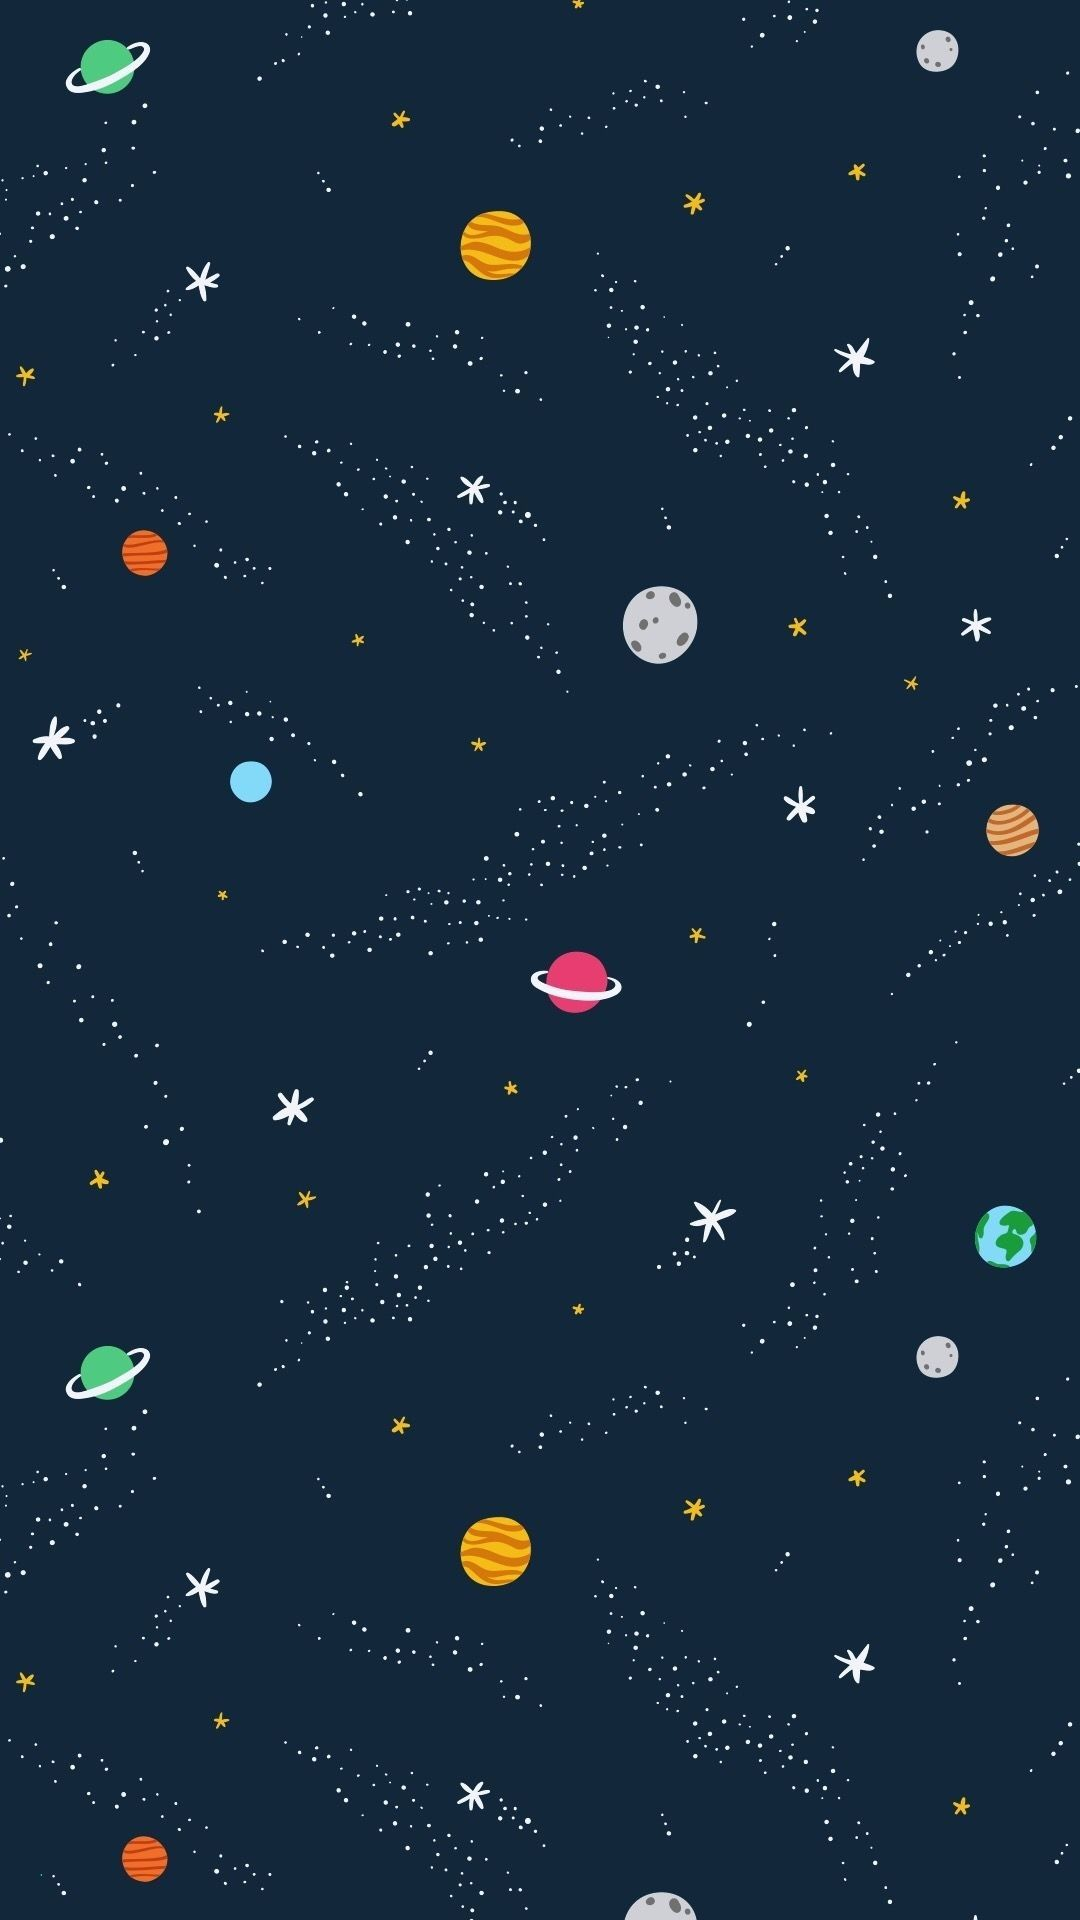 Image Result For Wallpaper Iphone 5s Tumblr Fondos De